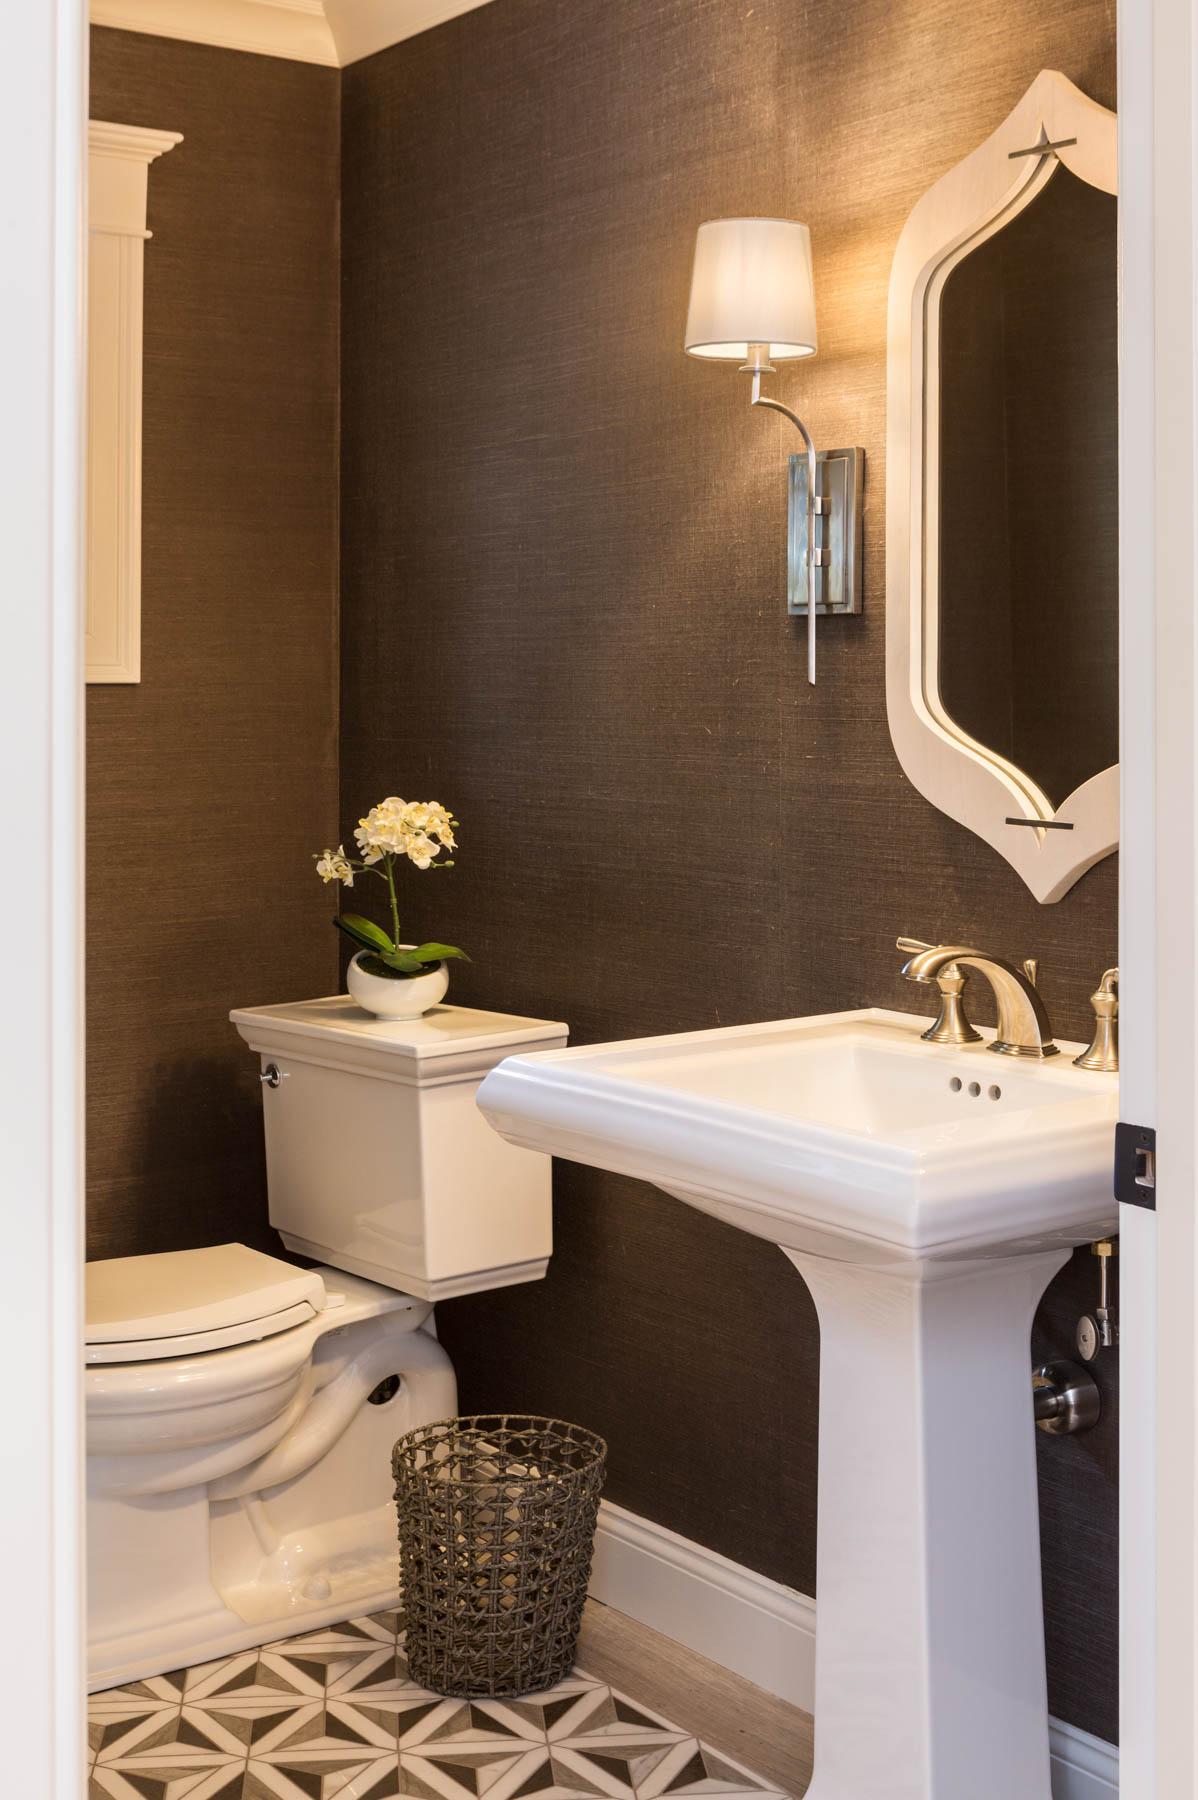 Artistic tile in bathroom by Lauren Milligan